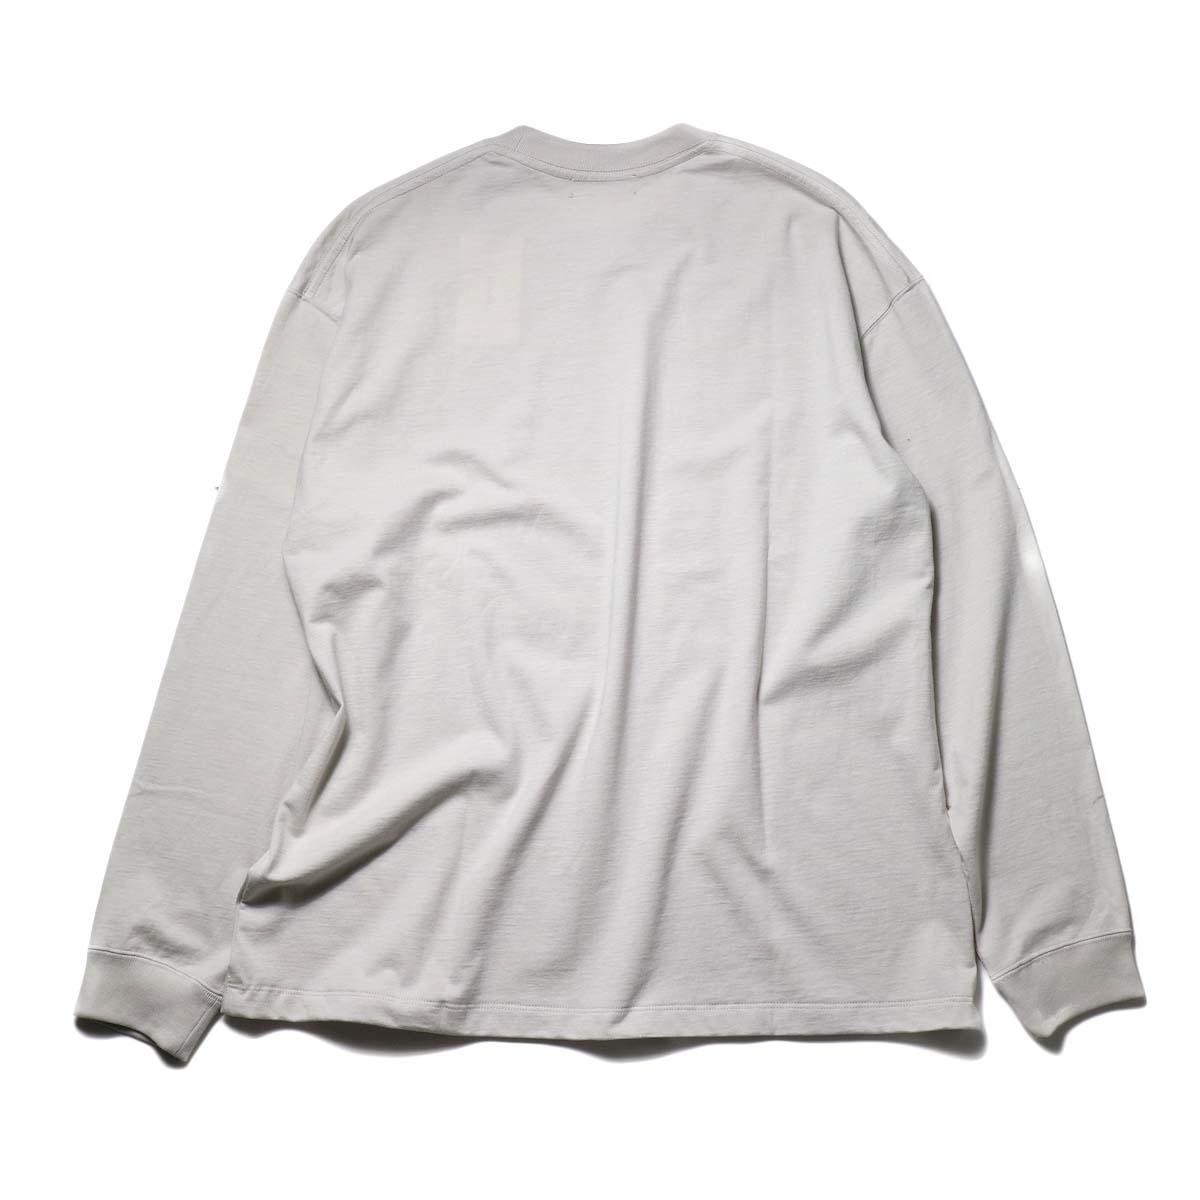 alvana / TANGUIS L/S TEE SHIRTS (Ecru Gray)背面